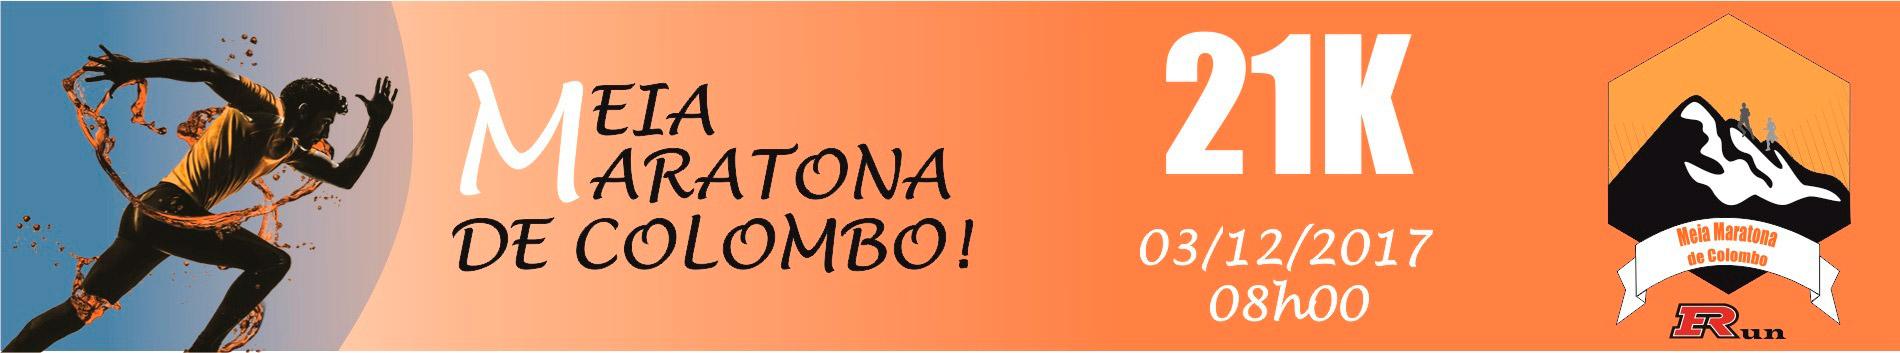 MEIA MARATONA DE COLOMBO - 2017 - Imagem de topo